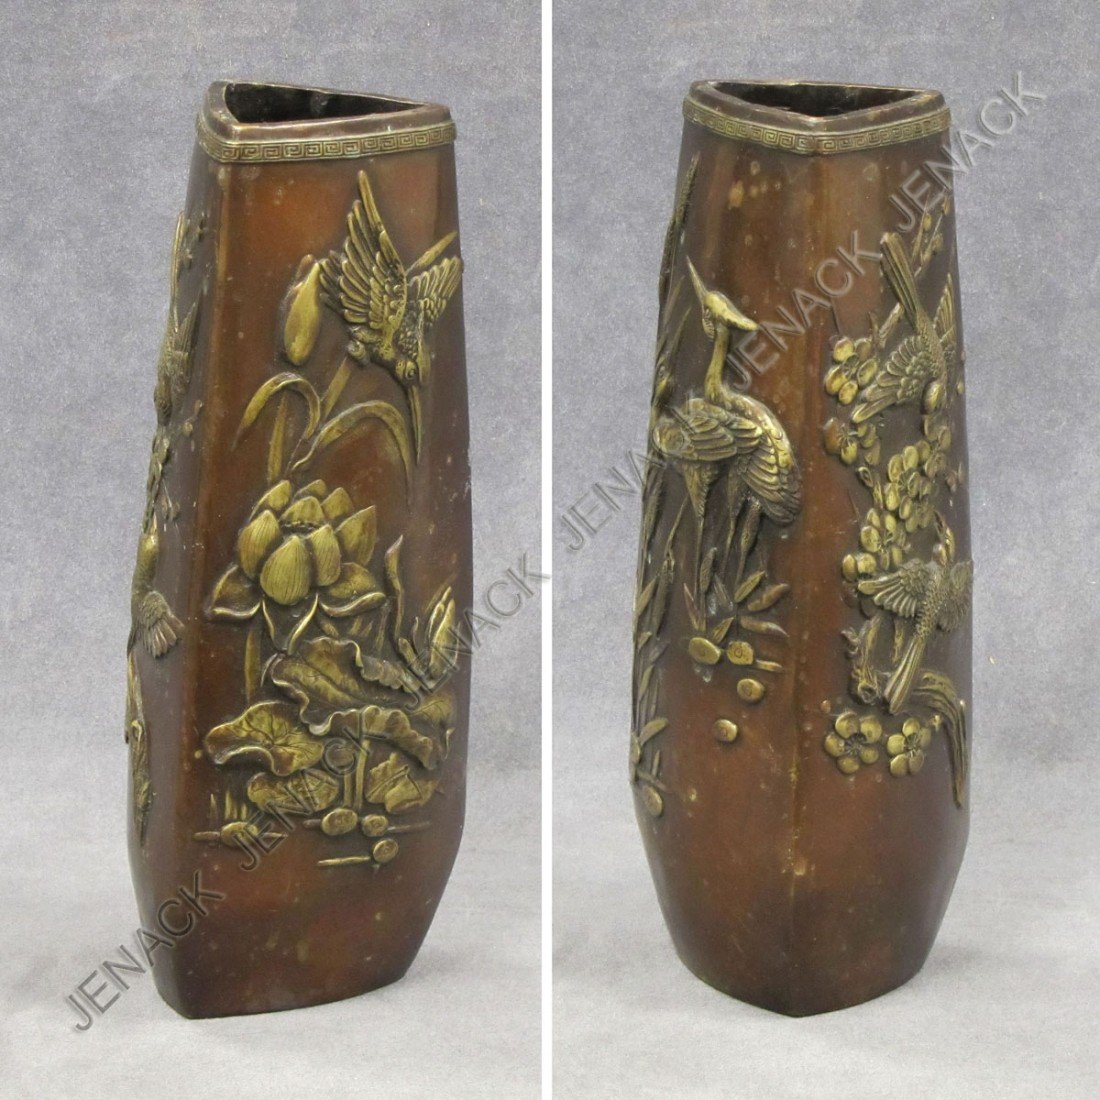 98: JAPANESE GILT BRONZE RELIEF VASE, 19TH CENTURY